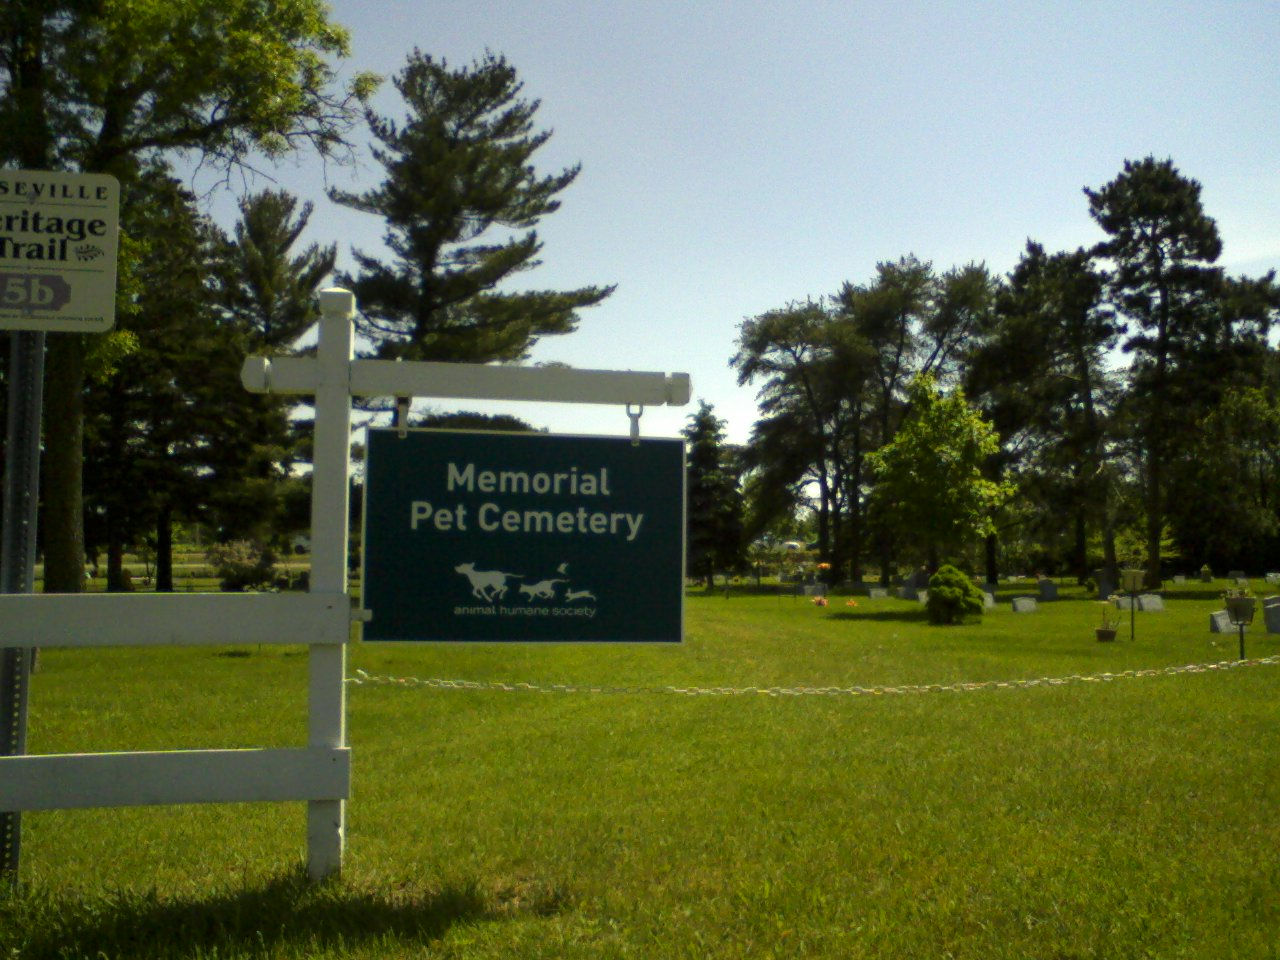 http://3.bp.blogspot.com/-PGaDa5xj_yU/ThTk01nhSJI/AAAAAAAACDw/GyFvdJZCHd8/s1600/pet_cemetery.jpg